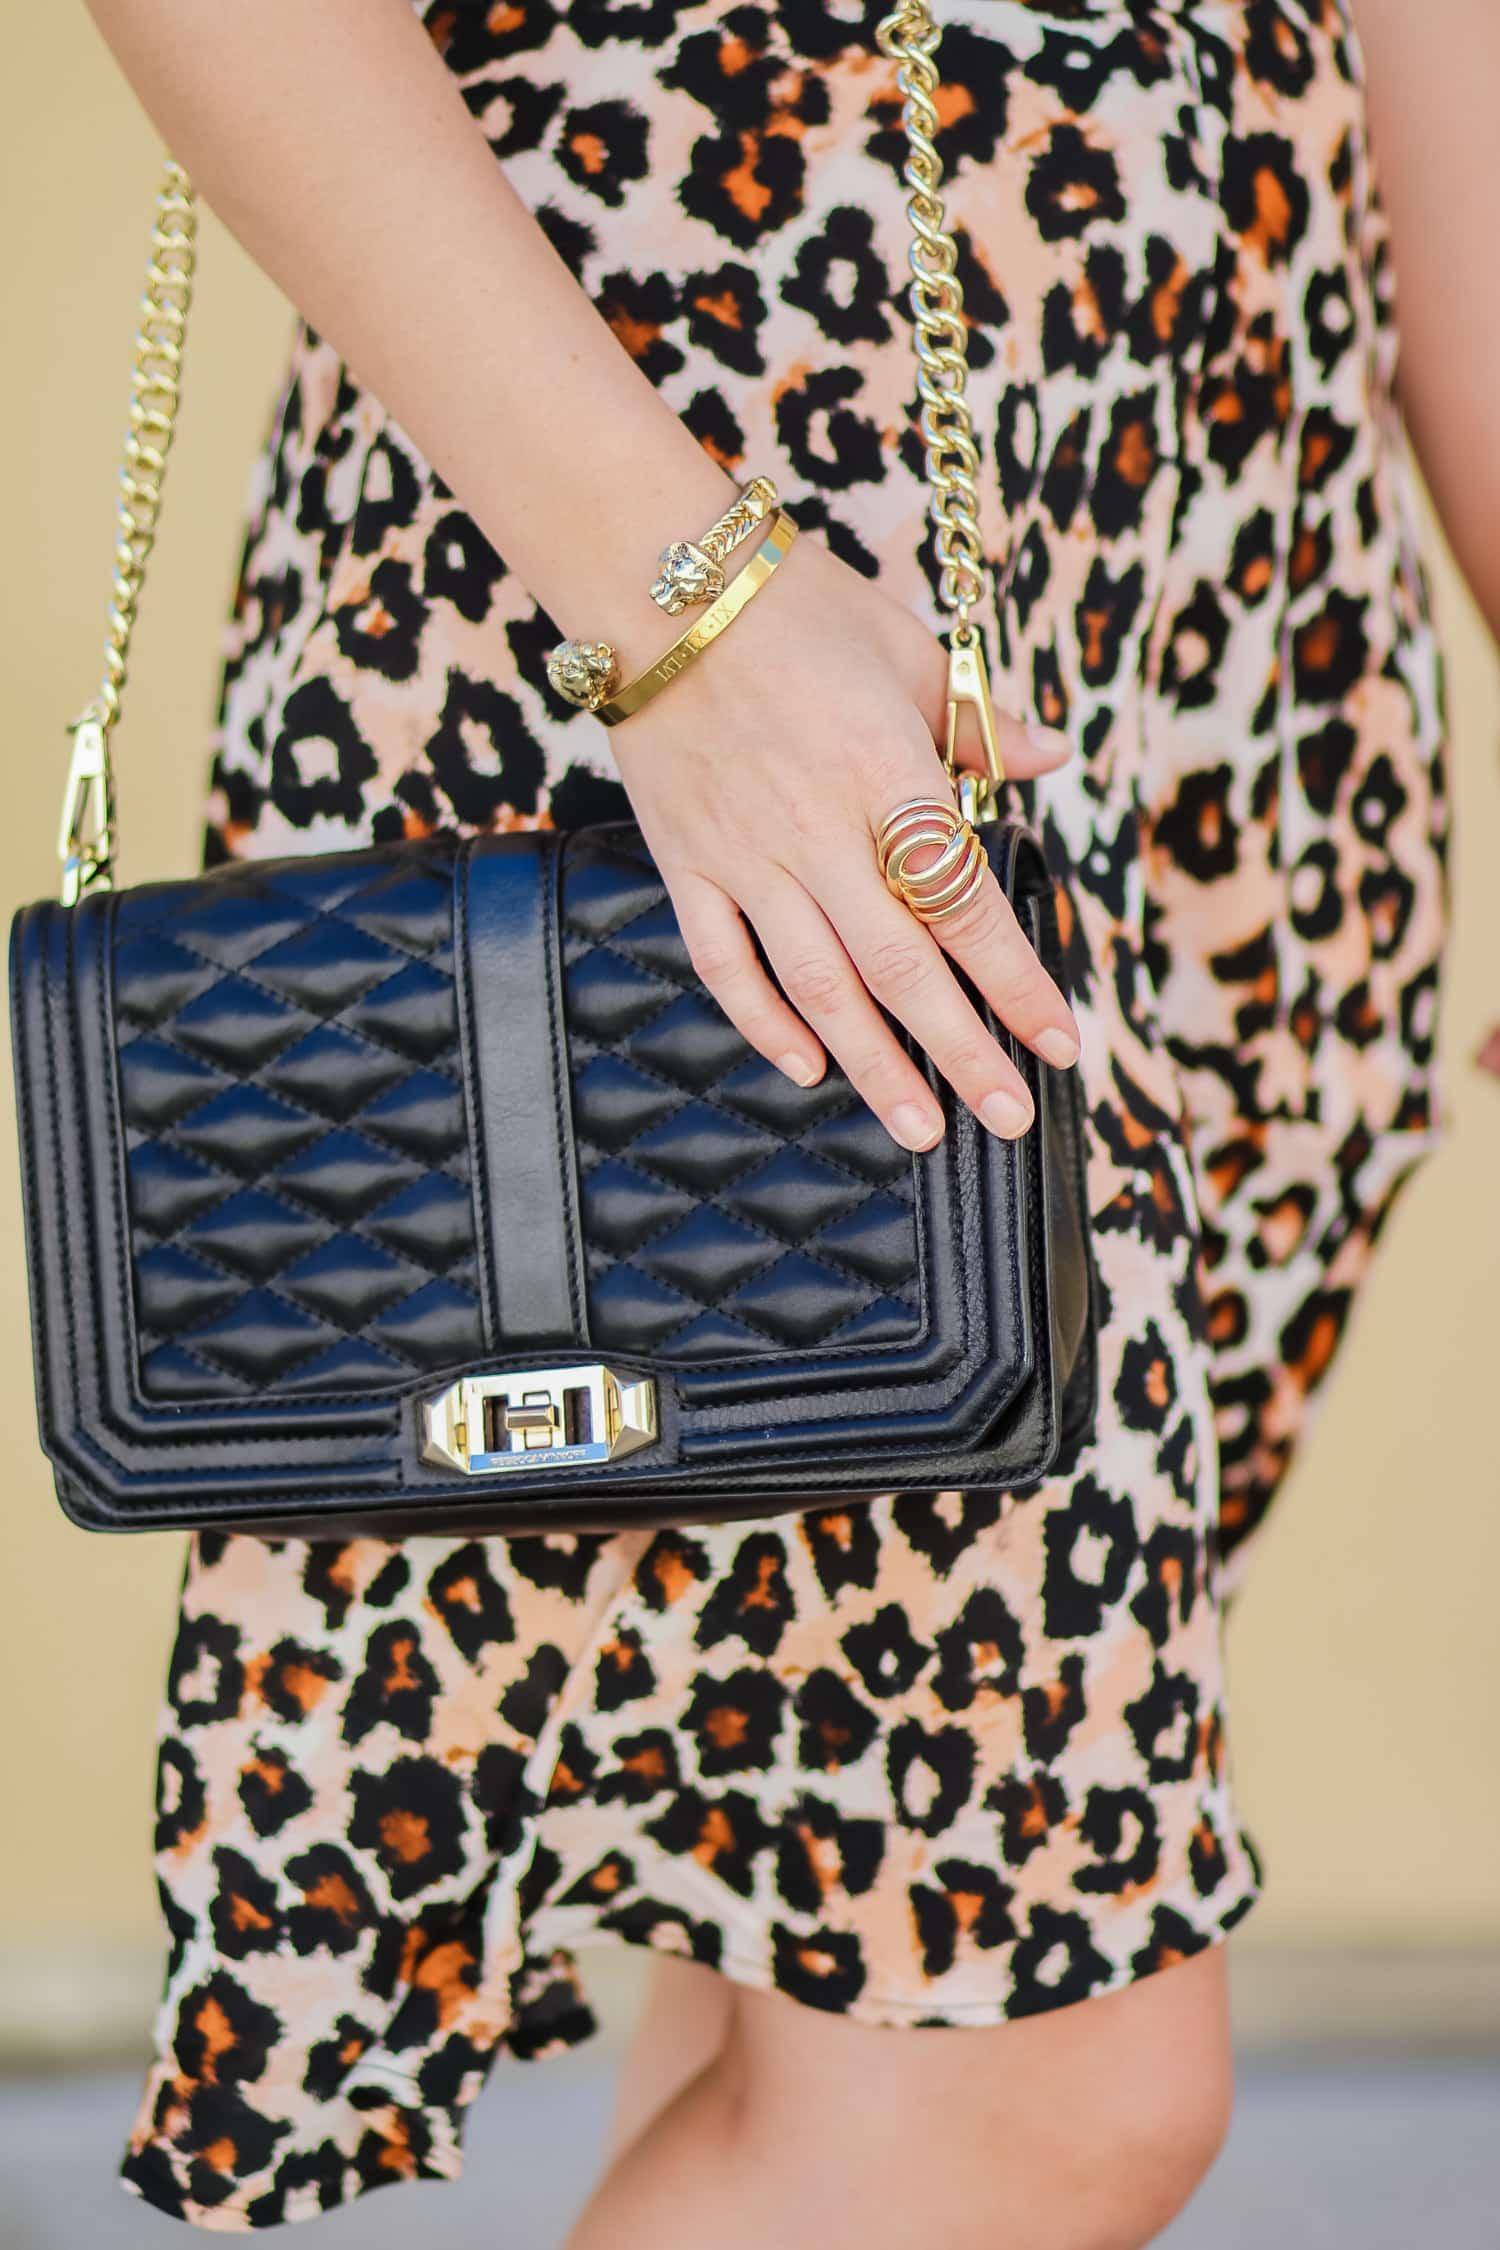 rebecca-minkoff-black-quilted-purse-1073